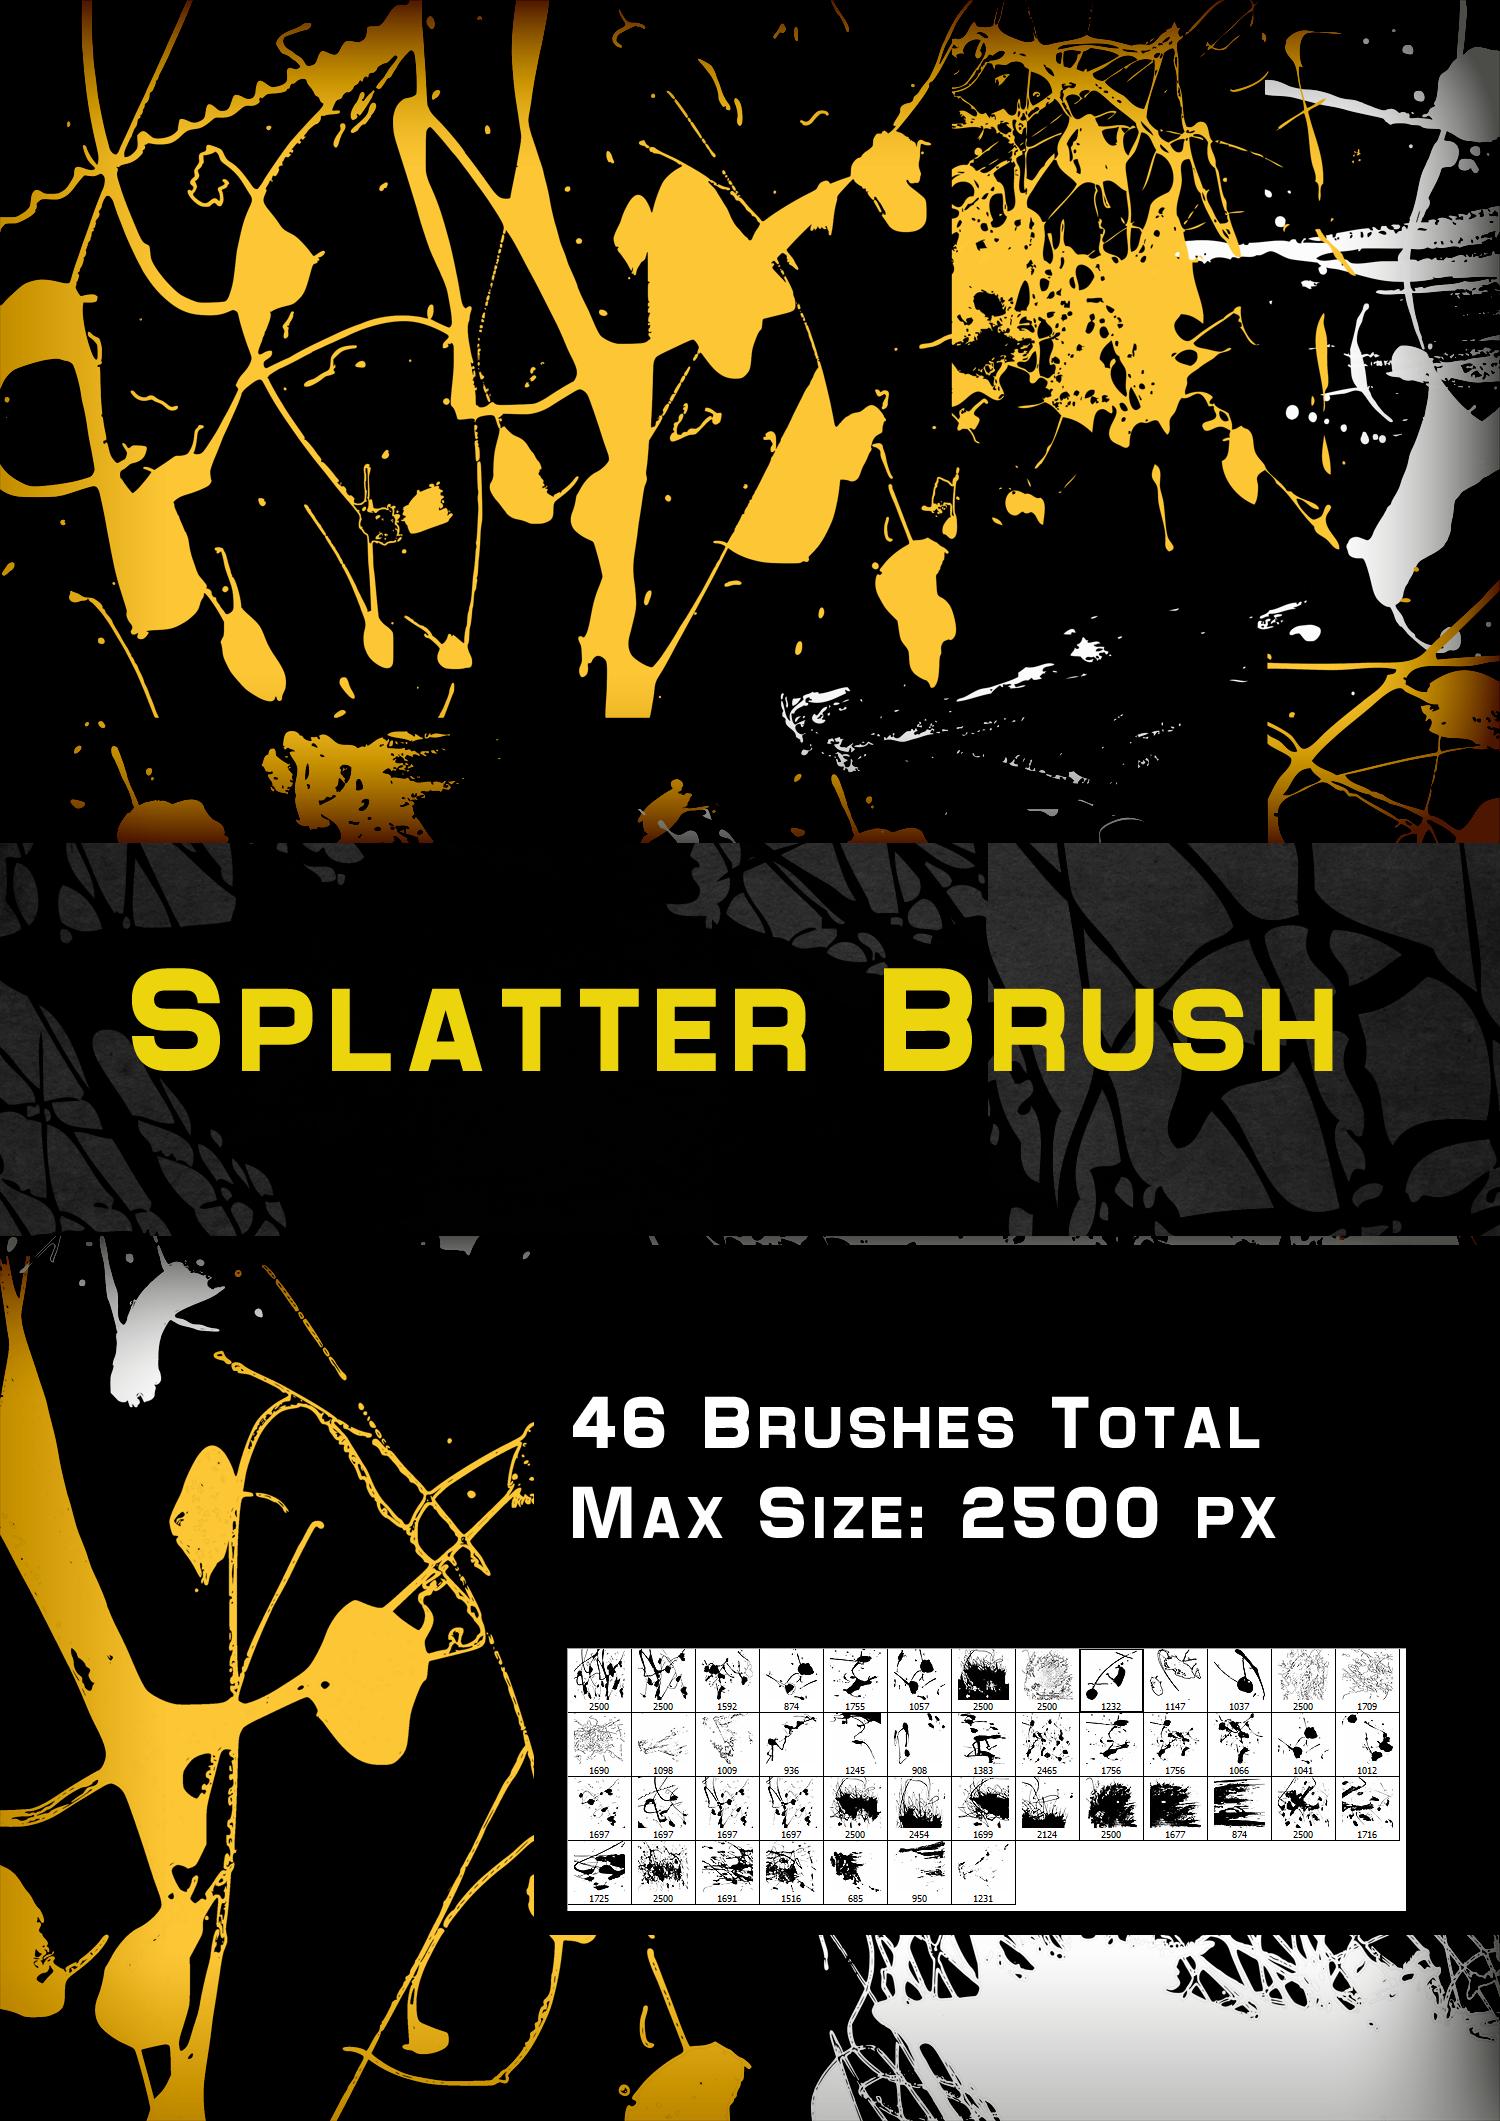 Splatter Brush by me by MartinSiilak